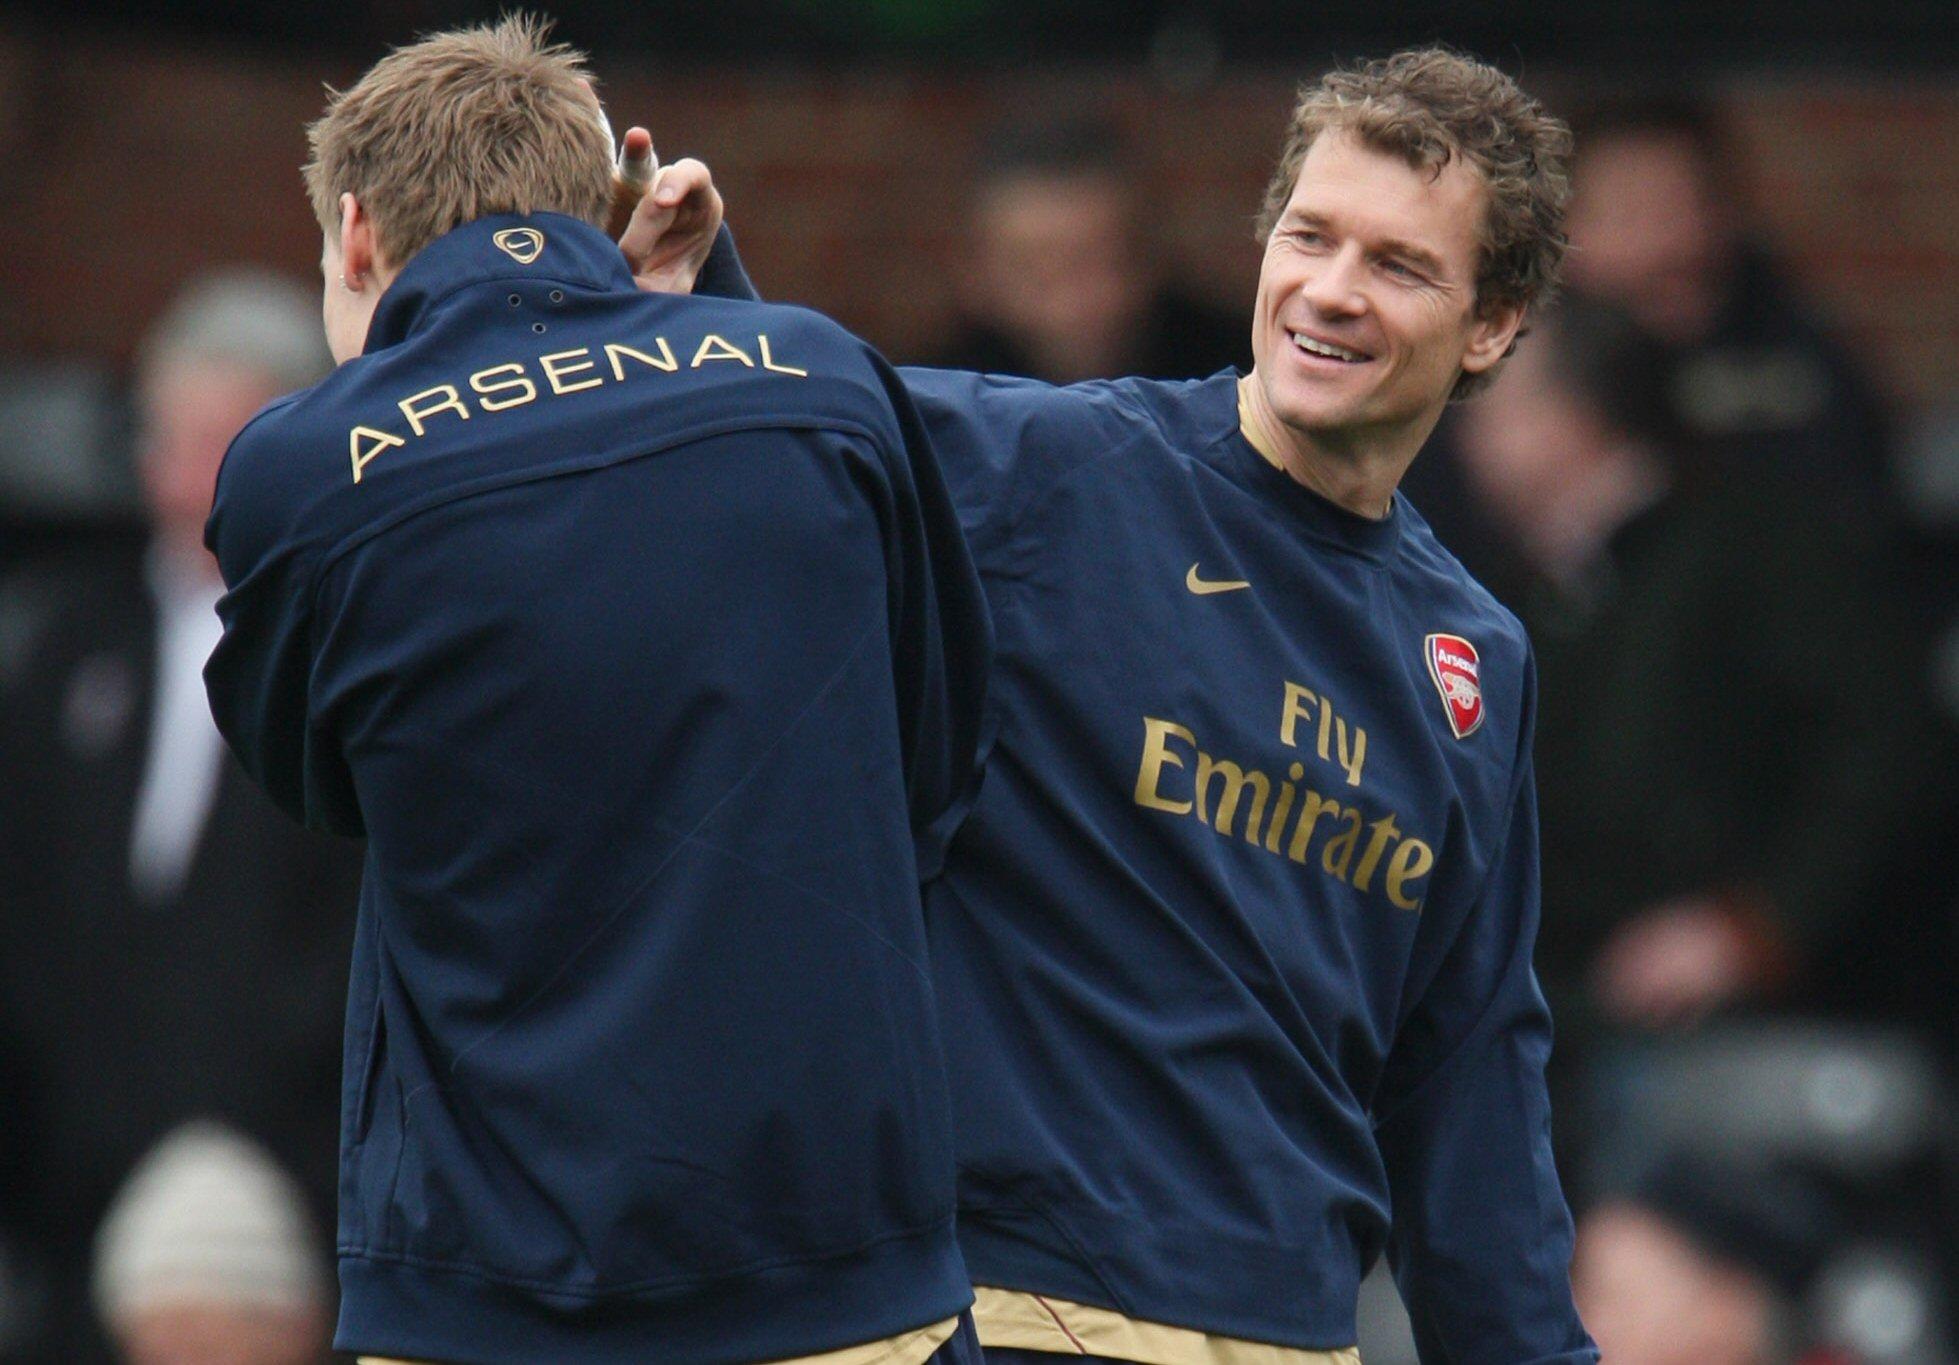 Lehmann praises Arsenal shot-stopper as one of the best ever